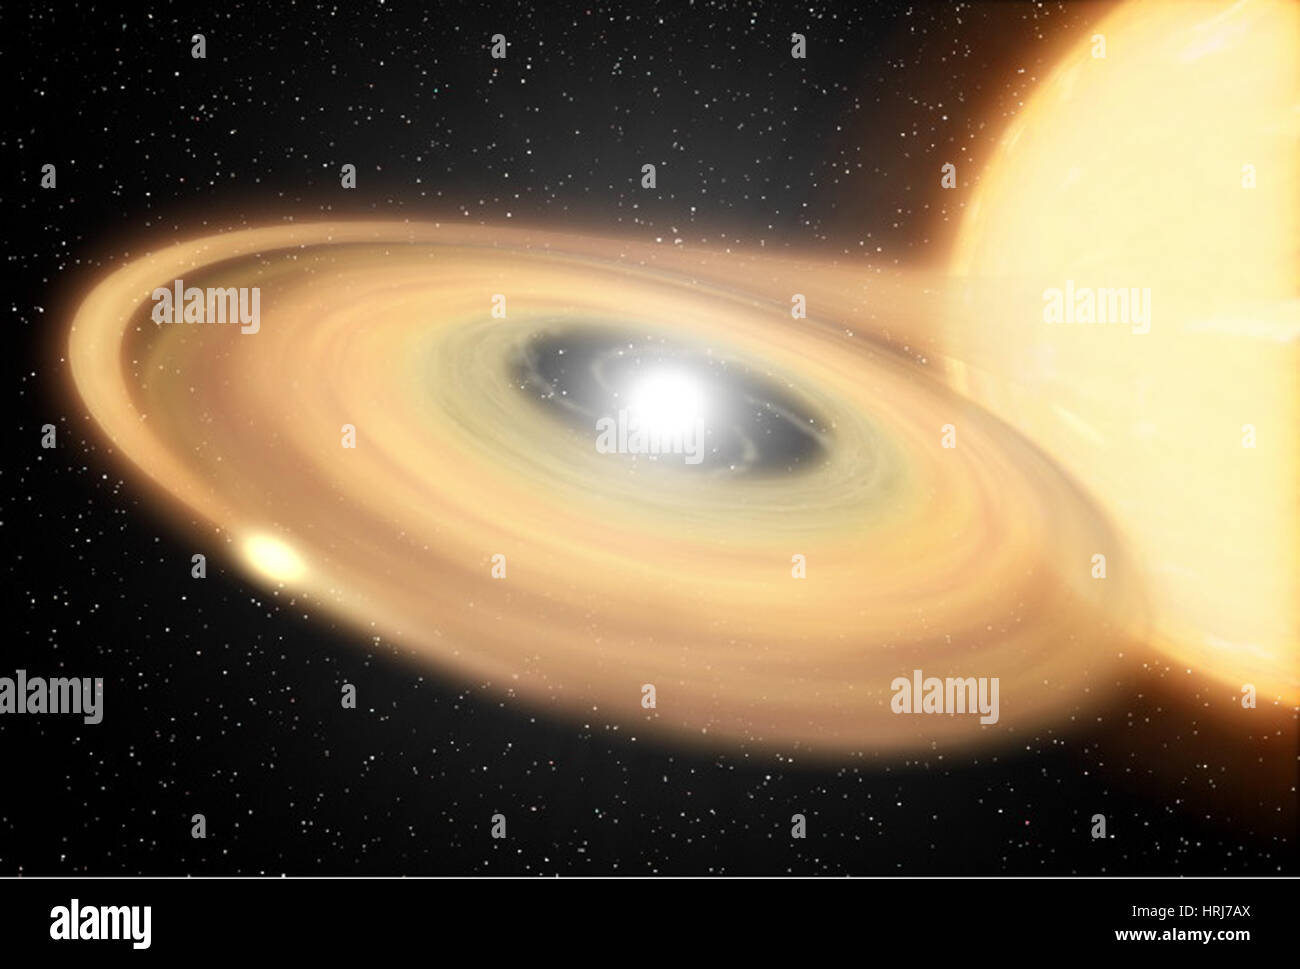 Z Camelopardalis, Z Cam, Cataclysmic Variable Star - Stock Image